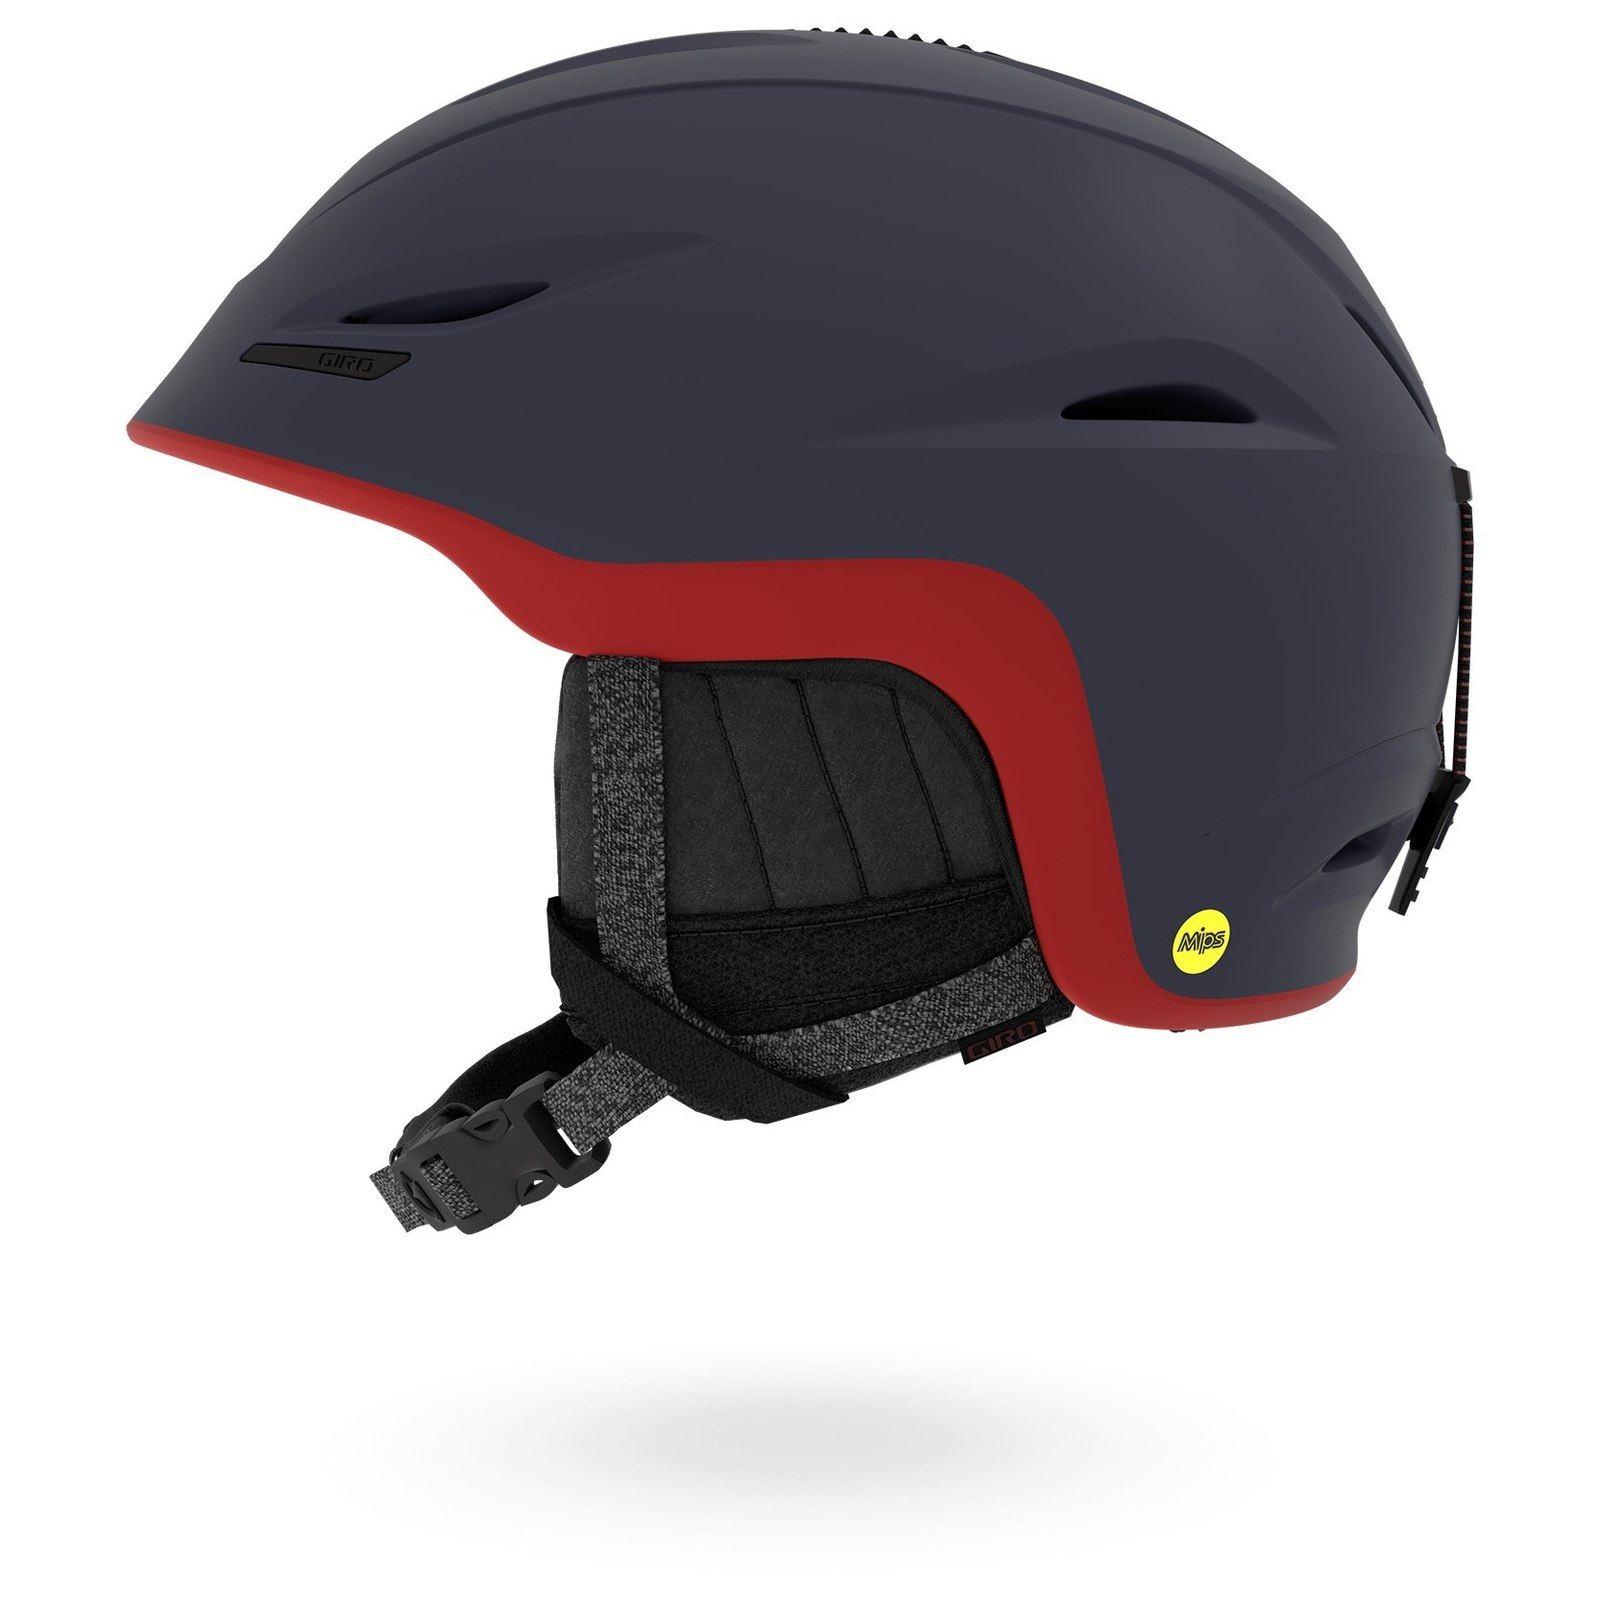 Ski Helmet Sale >> Giro Men S Union Mips Ski Helmet On Sale Powder7 Com